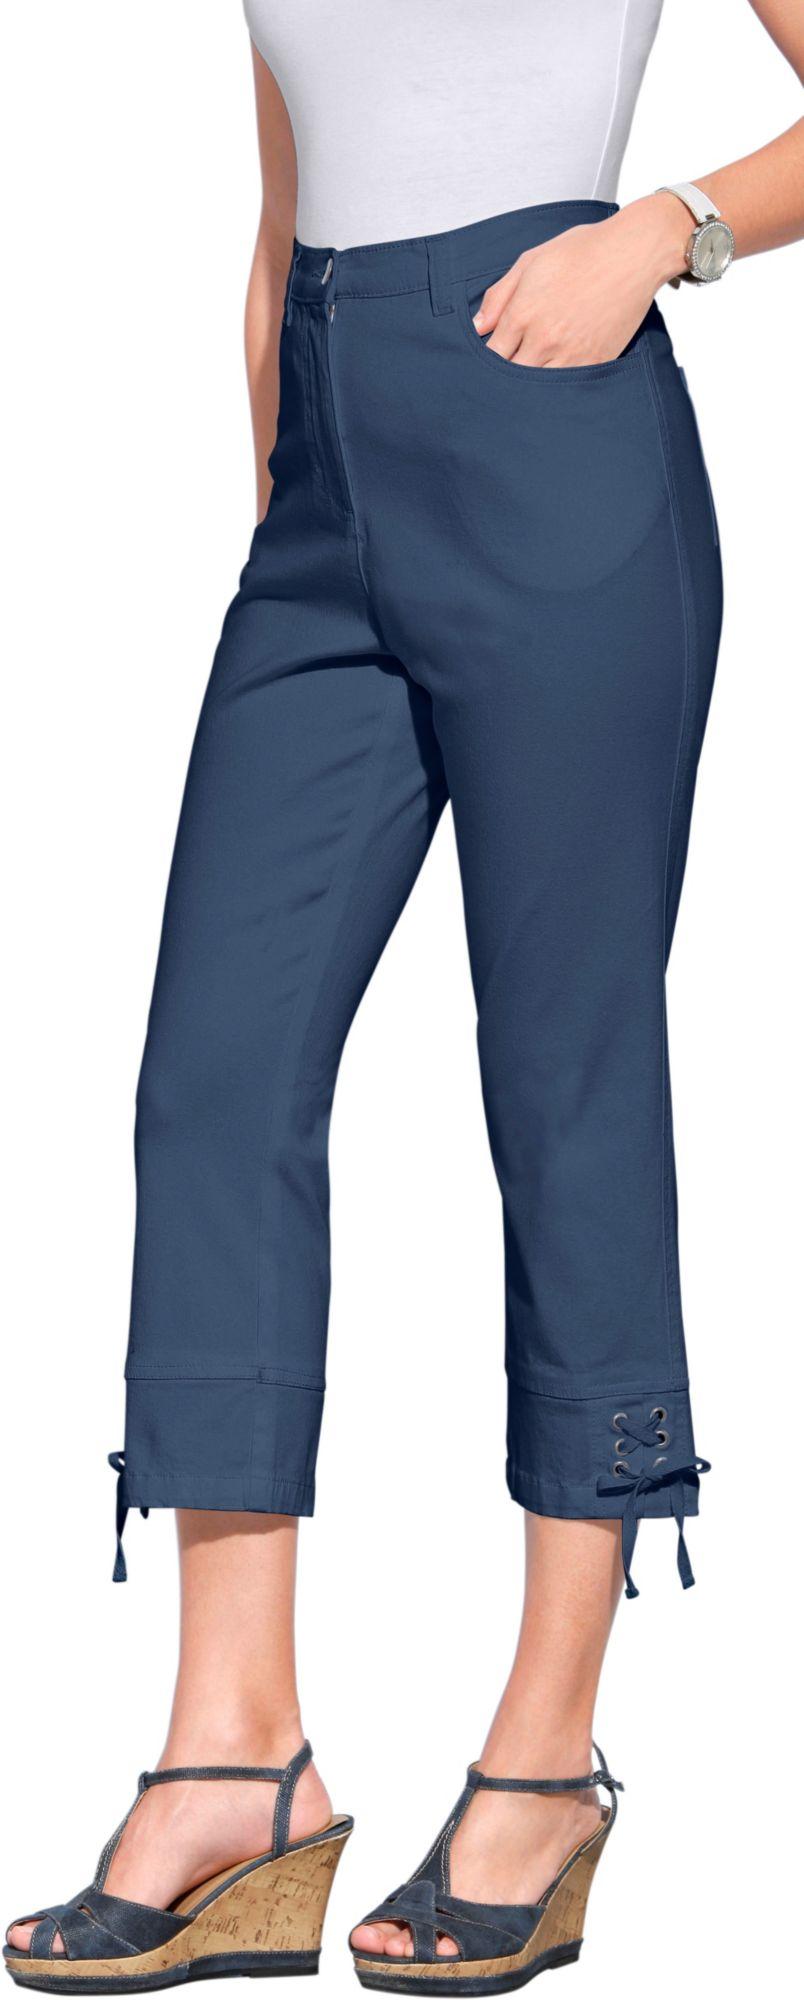 CLASSIC BASICS Classic Basics 3/4-Jeans mit Bindebändern an den Beinabschlüssen